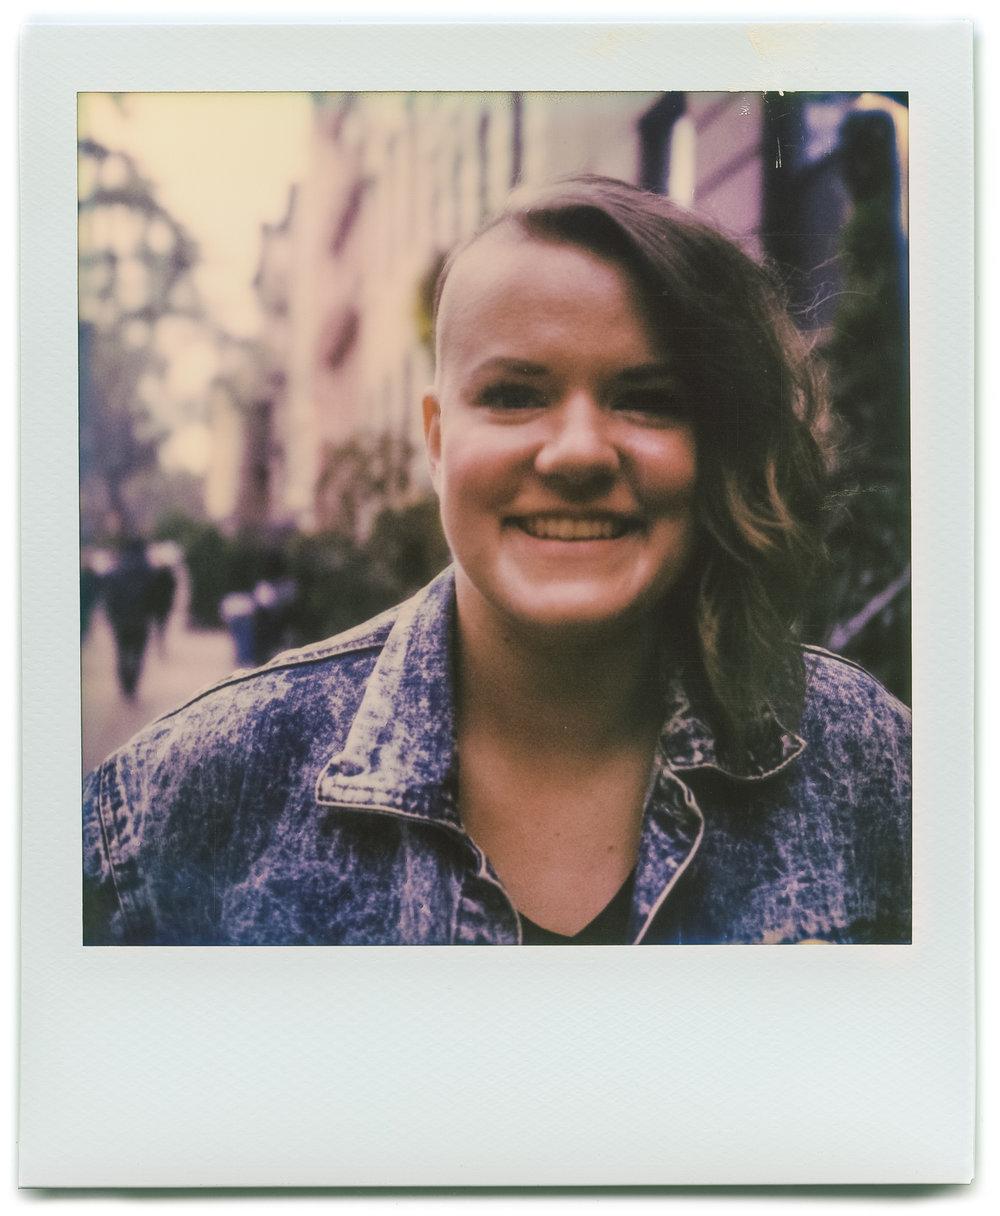 RJI Portraits POLA FB - 10.jpg